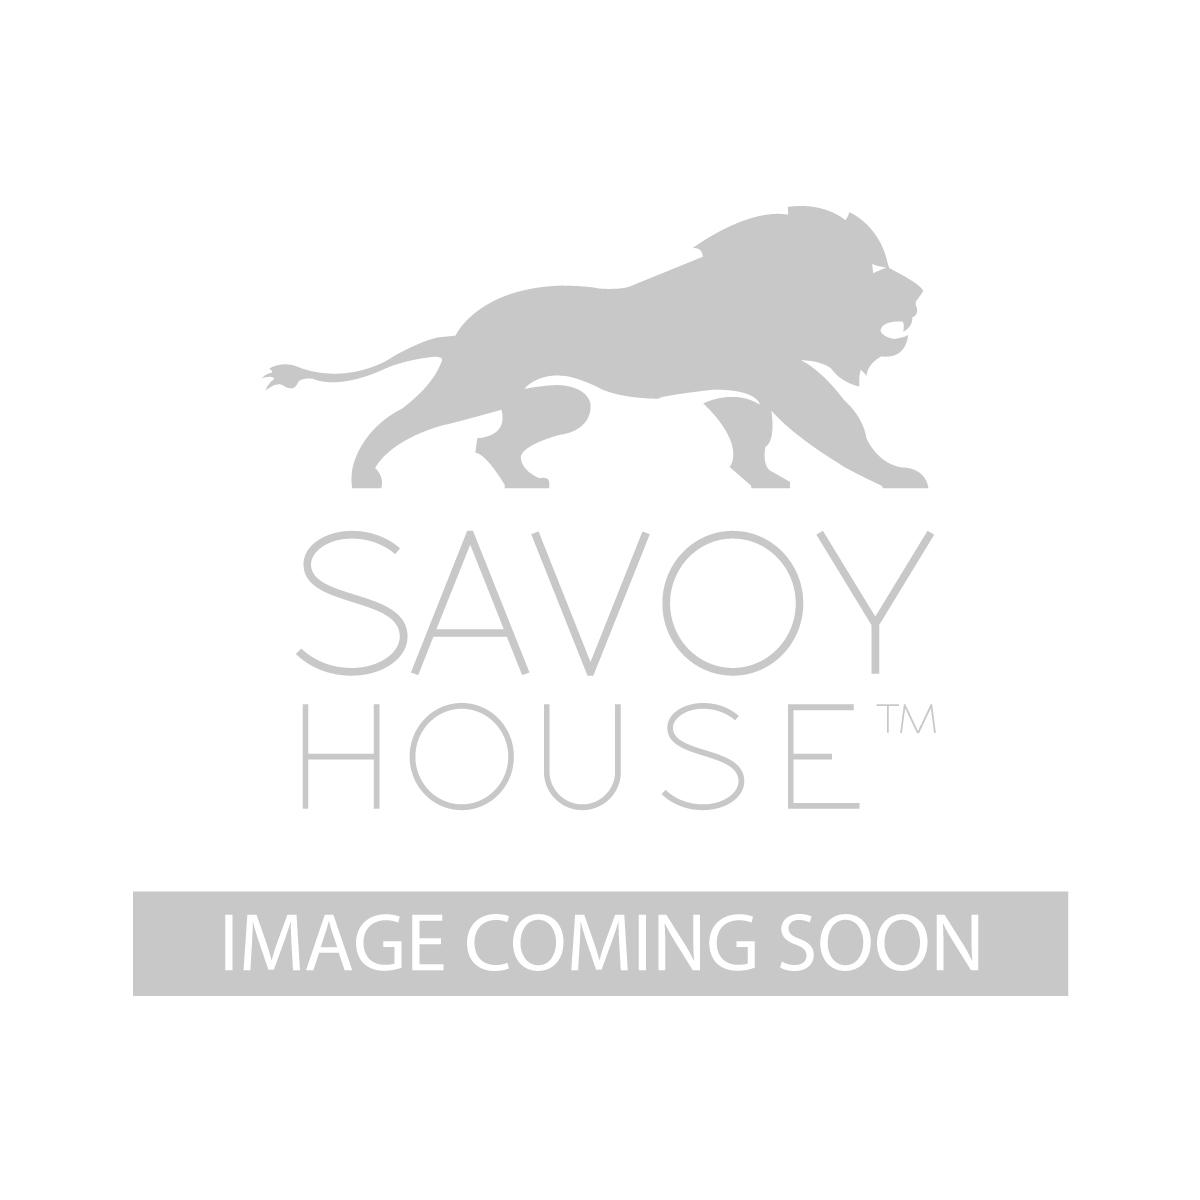 welch 8 light outdoor chandelier - Savoy Lighting